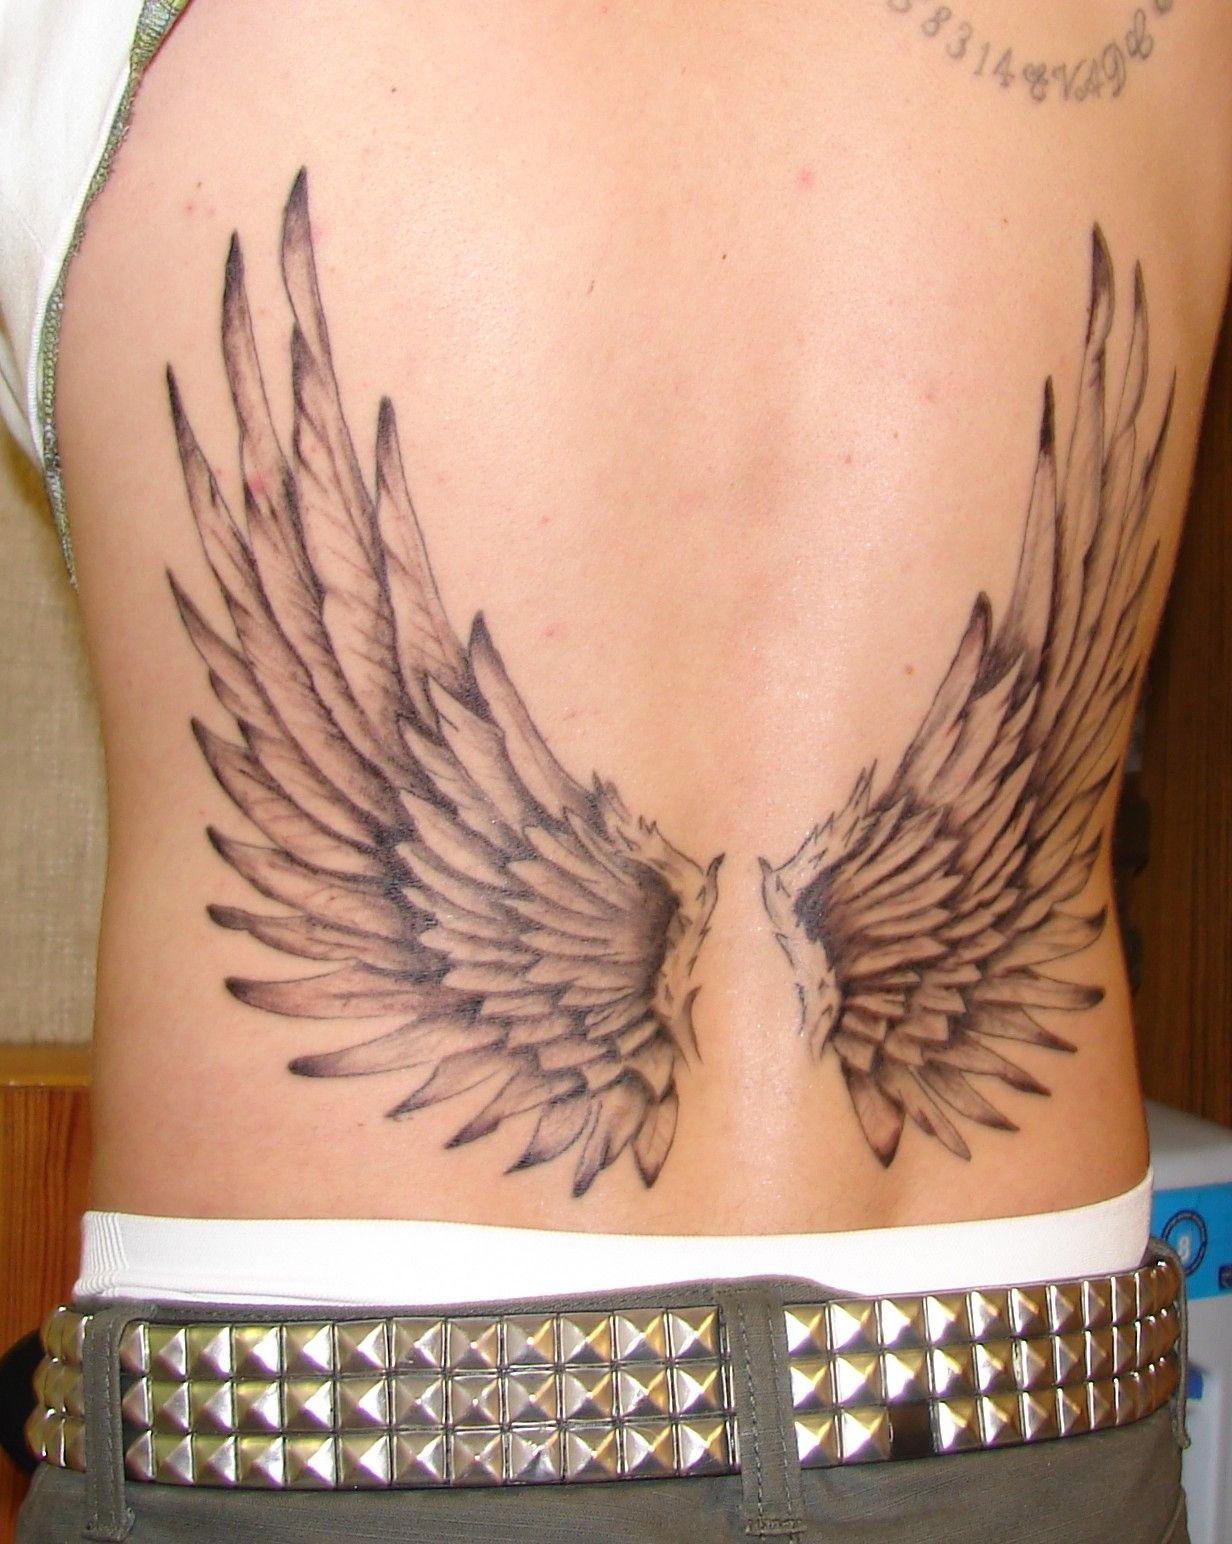 Wing tattoo design - 25 Angel Wings Tattoos Design Ideas